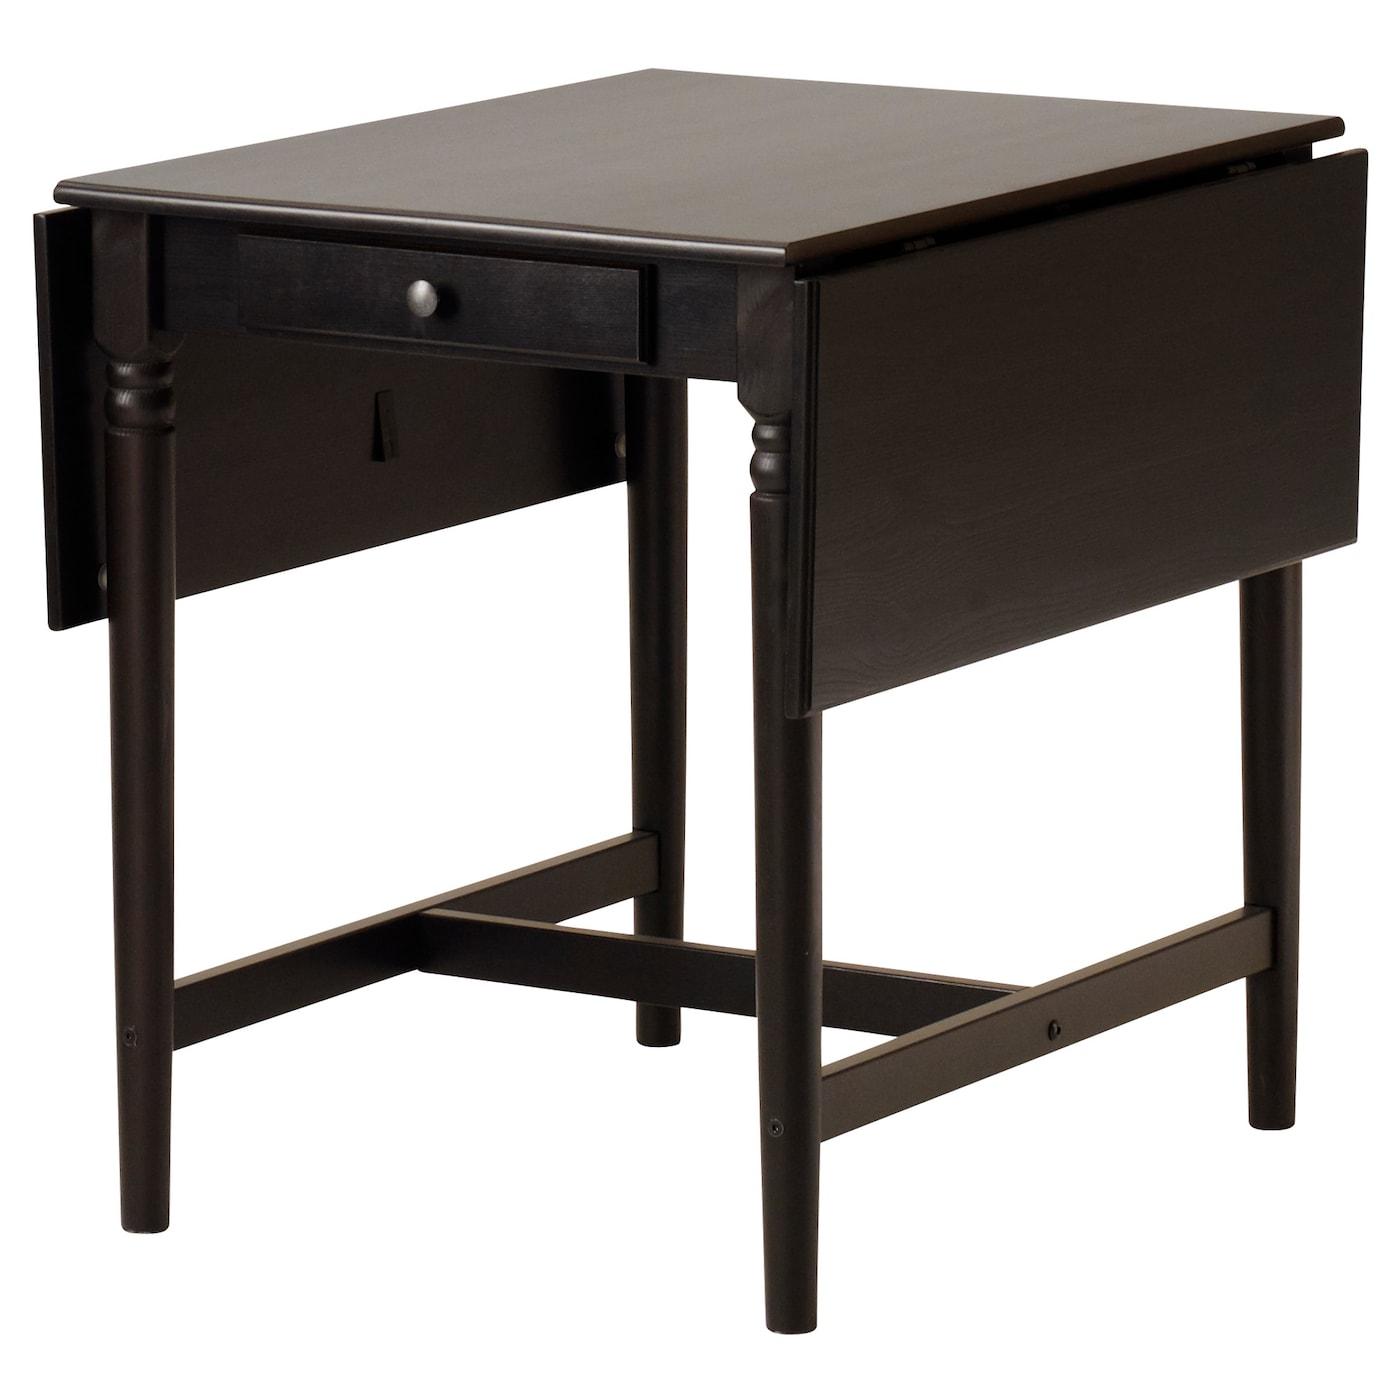 ingolf chair brown black ikea. Black Bedroom Furniture Sets. Home Design Ideas